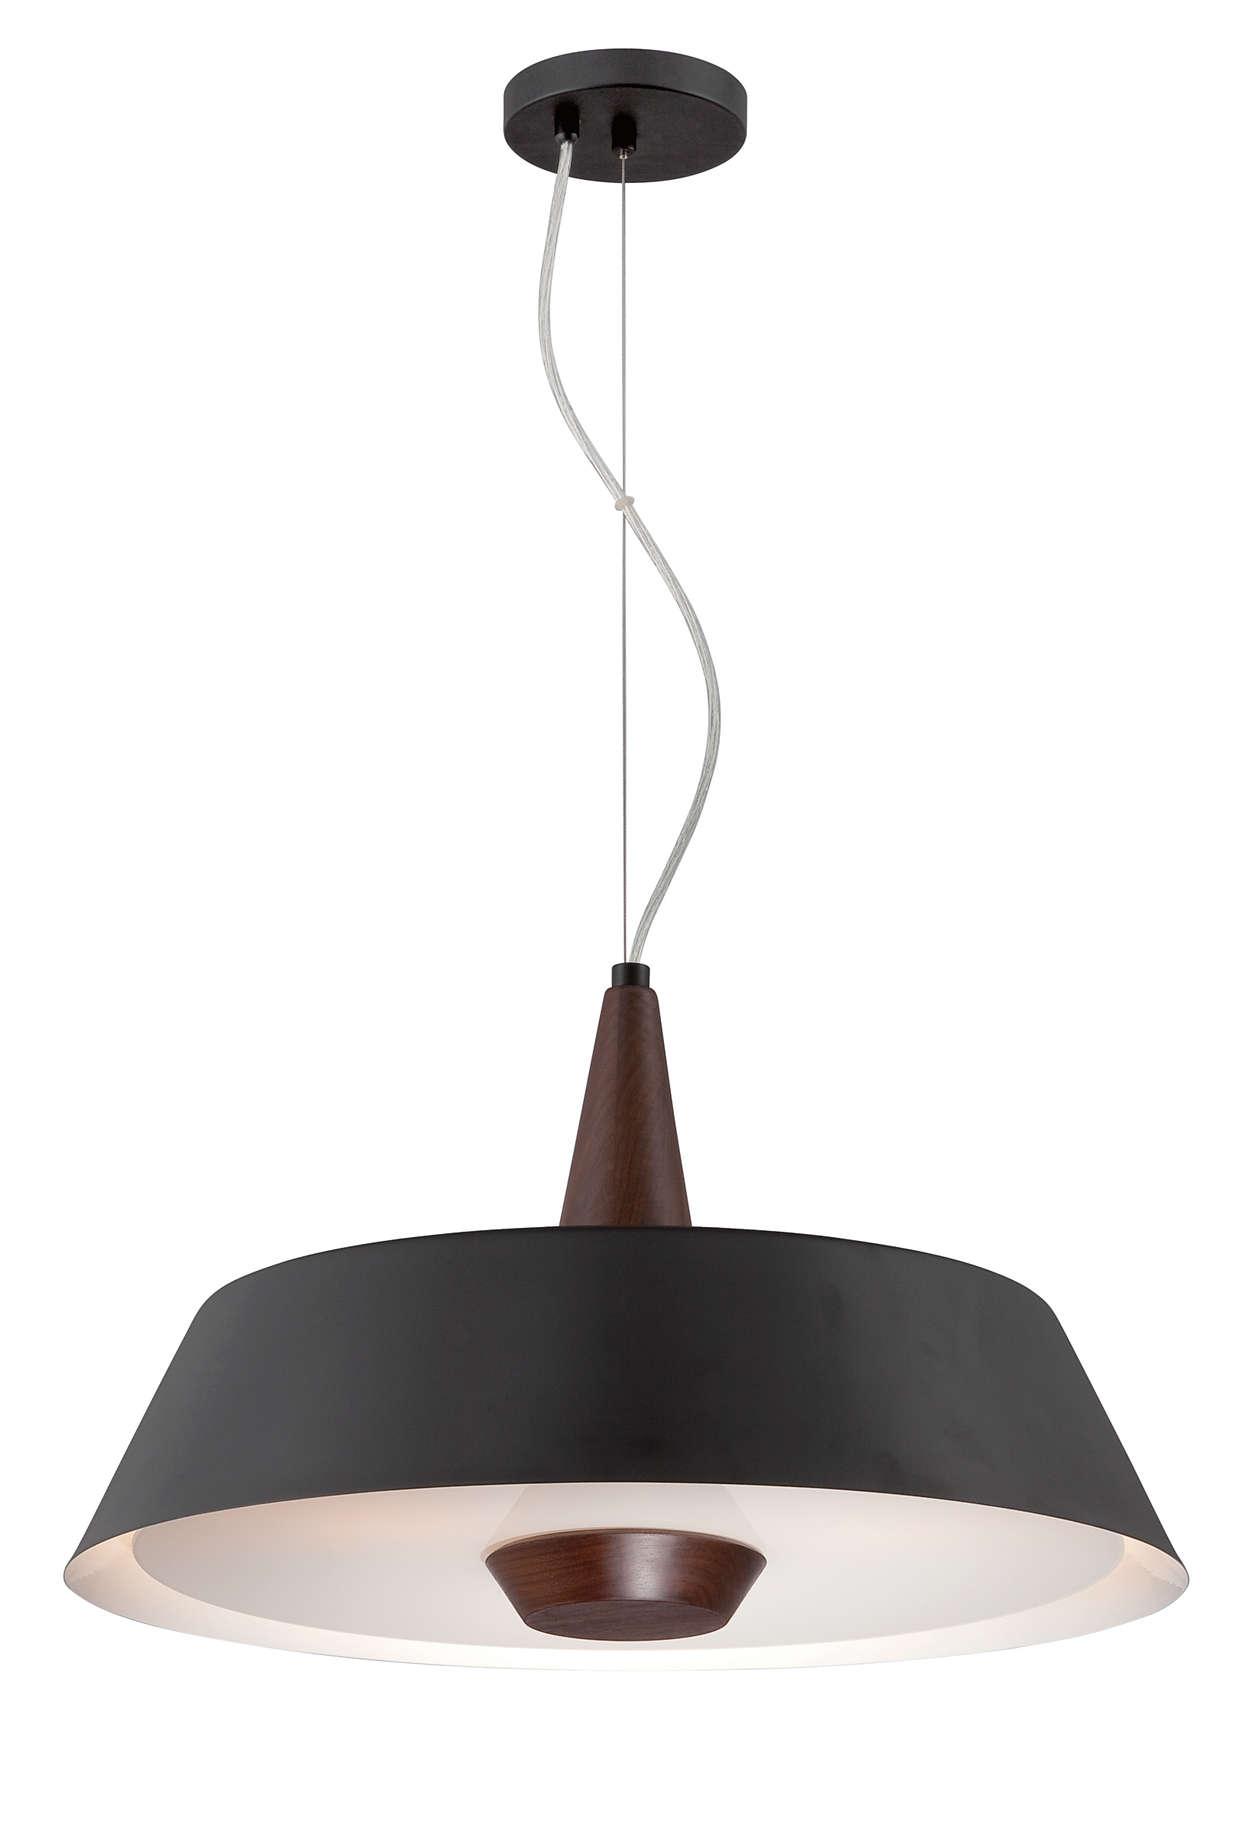 Rustique 3-light pendant